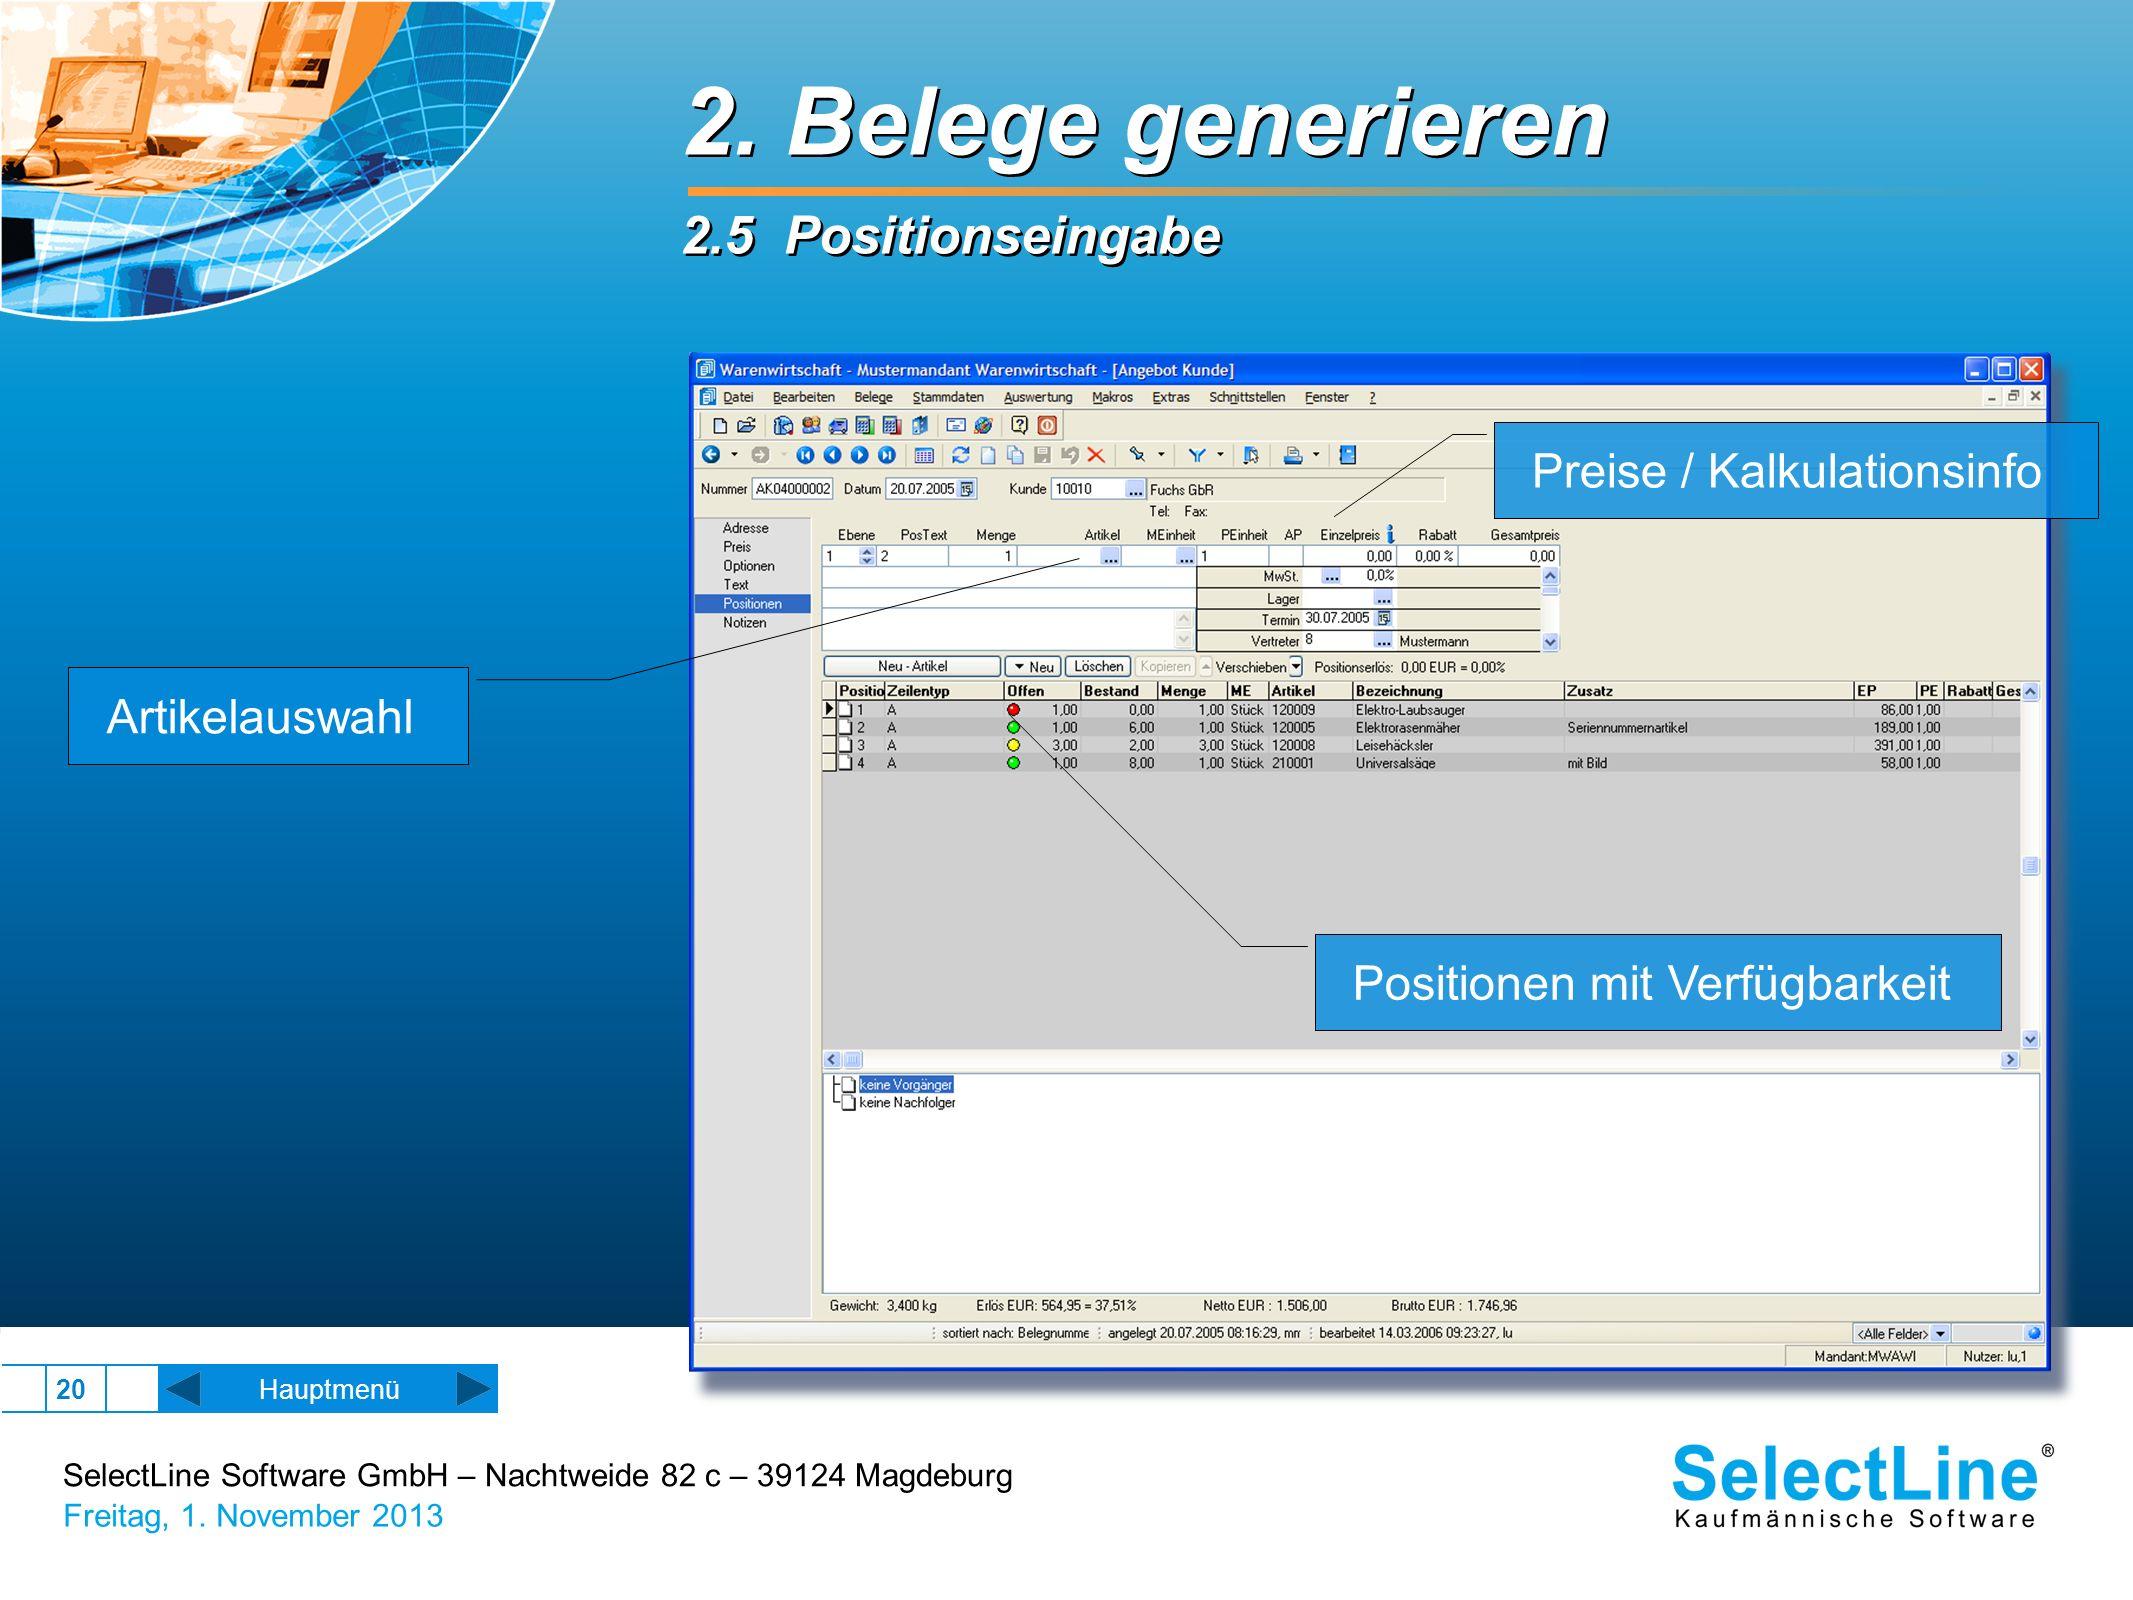 SelectLine Software GmbH – Nachtweide 82 c – 39124 Magdeburg Freitag, 1. November 2013 20 2. Belege generieren 2.5 Positionseingabe 2. Belege generier